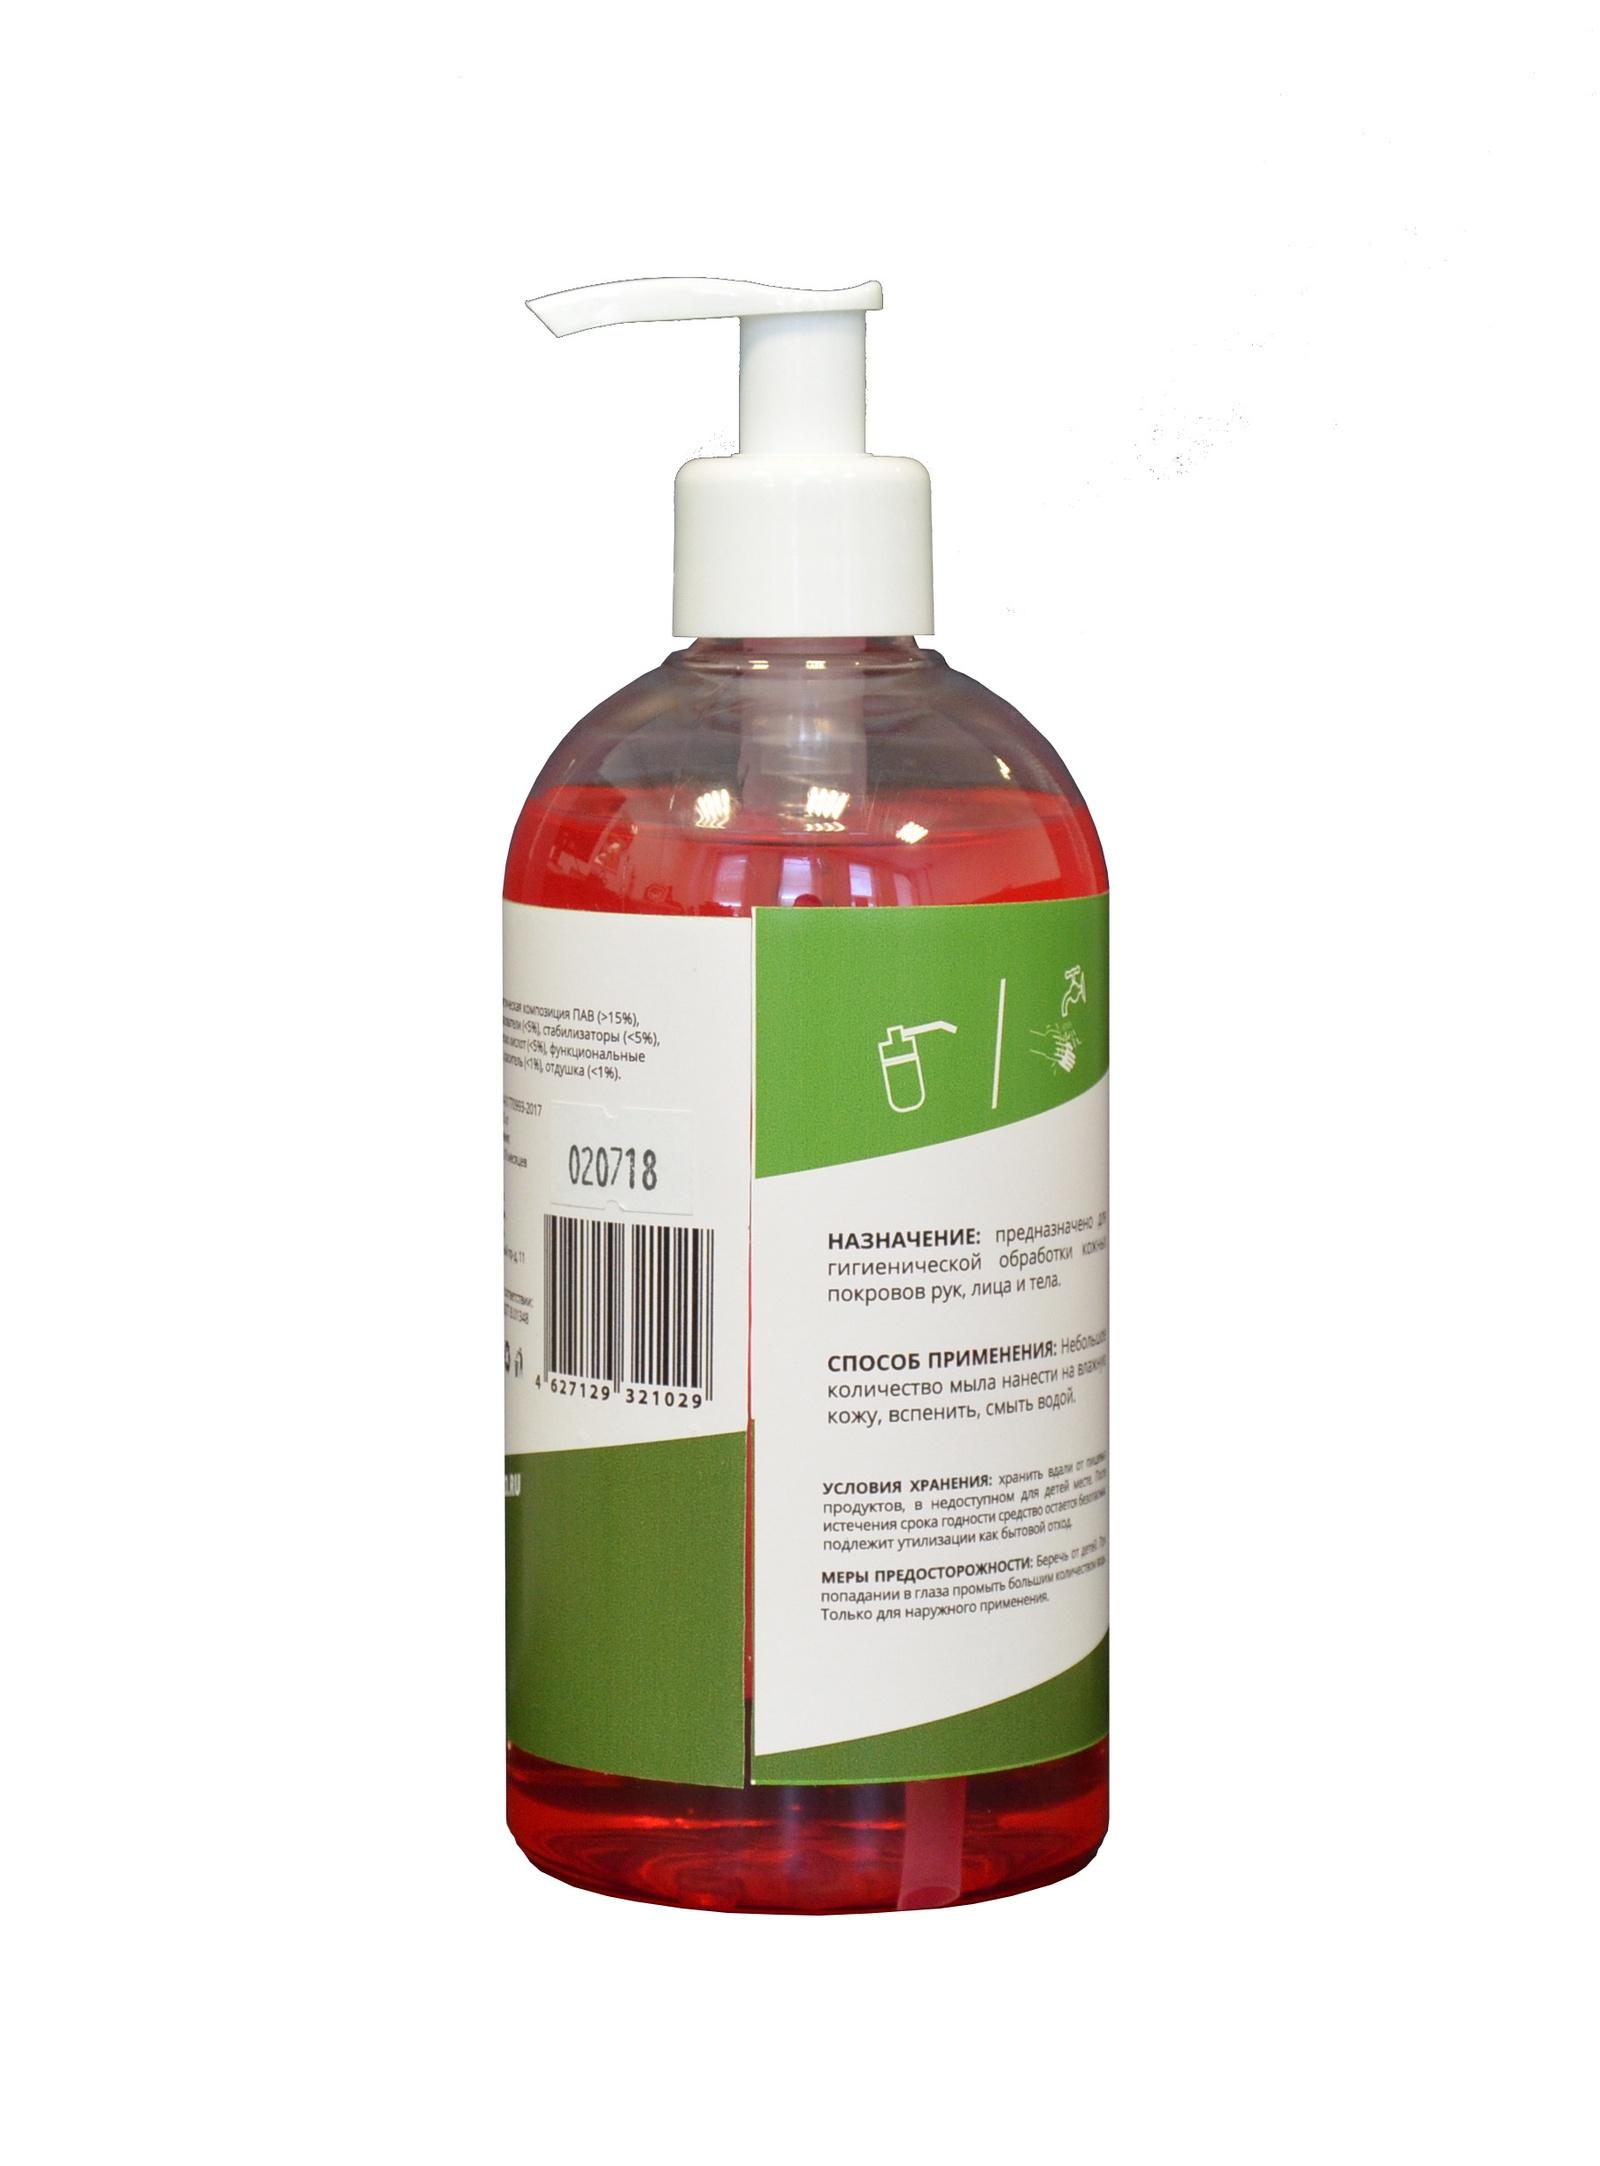 SynthecoЖидкое мыло Ягодный микс, 0,5 кг Syntheco